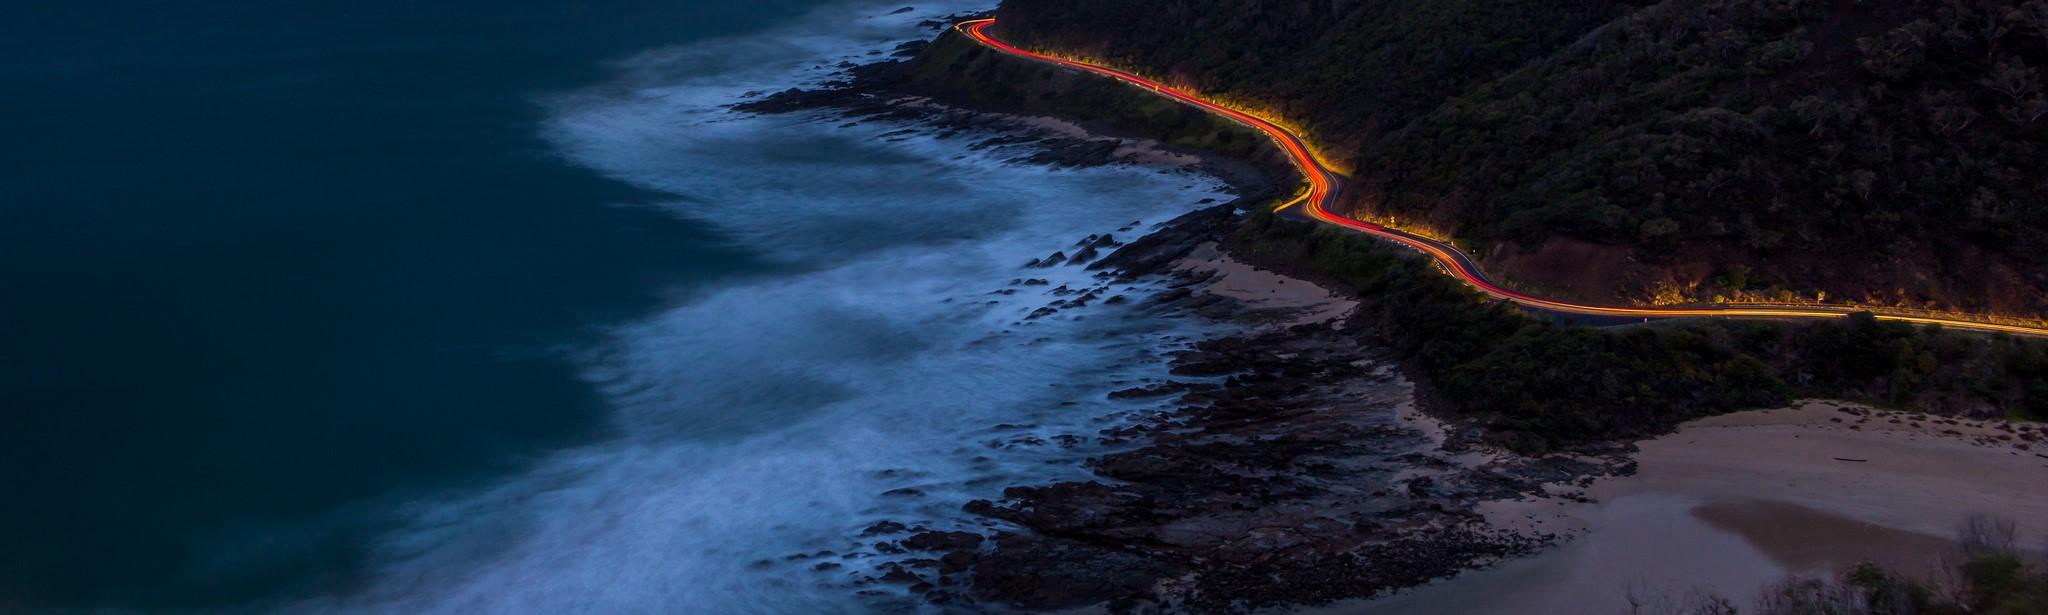 The Great Ocean Road, Australia (Photo: Michael Sanders/Flickr)